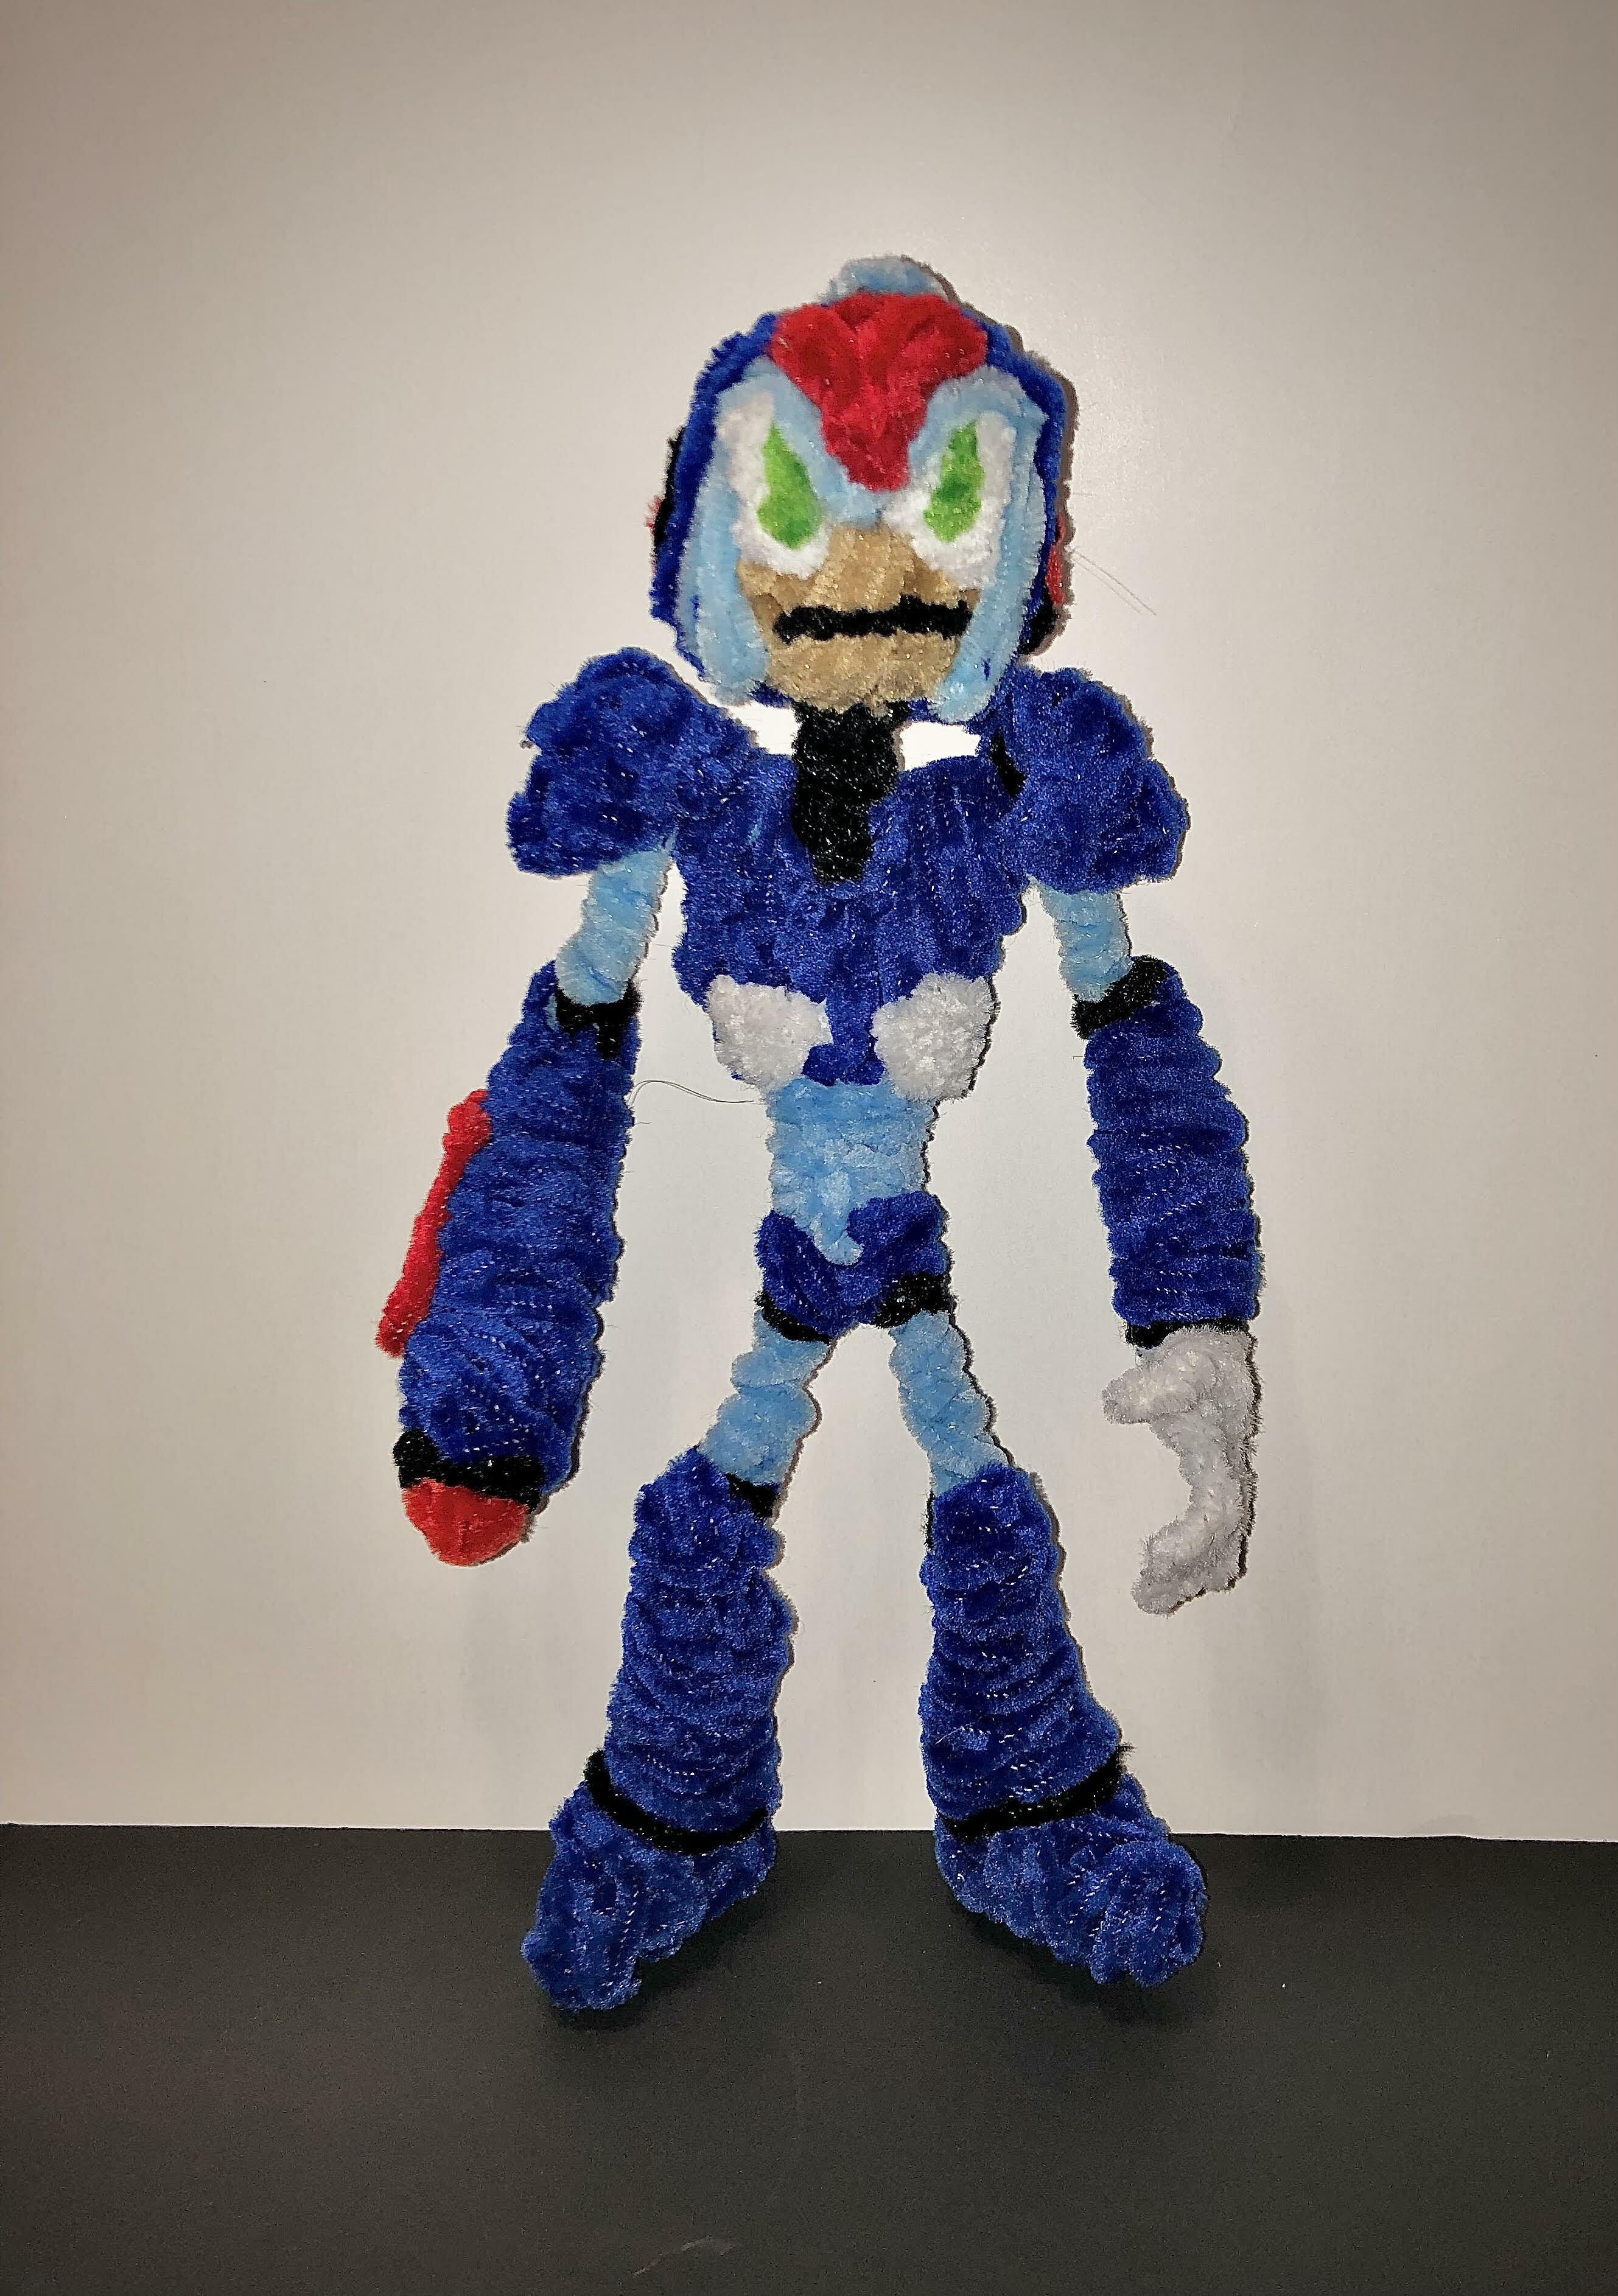 Mega Man X pie cleaner